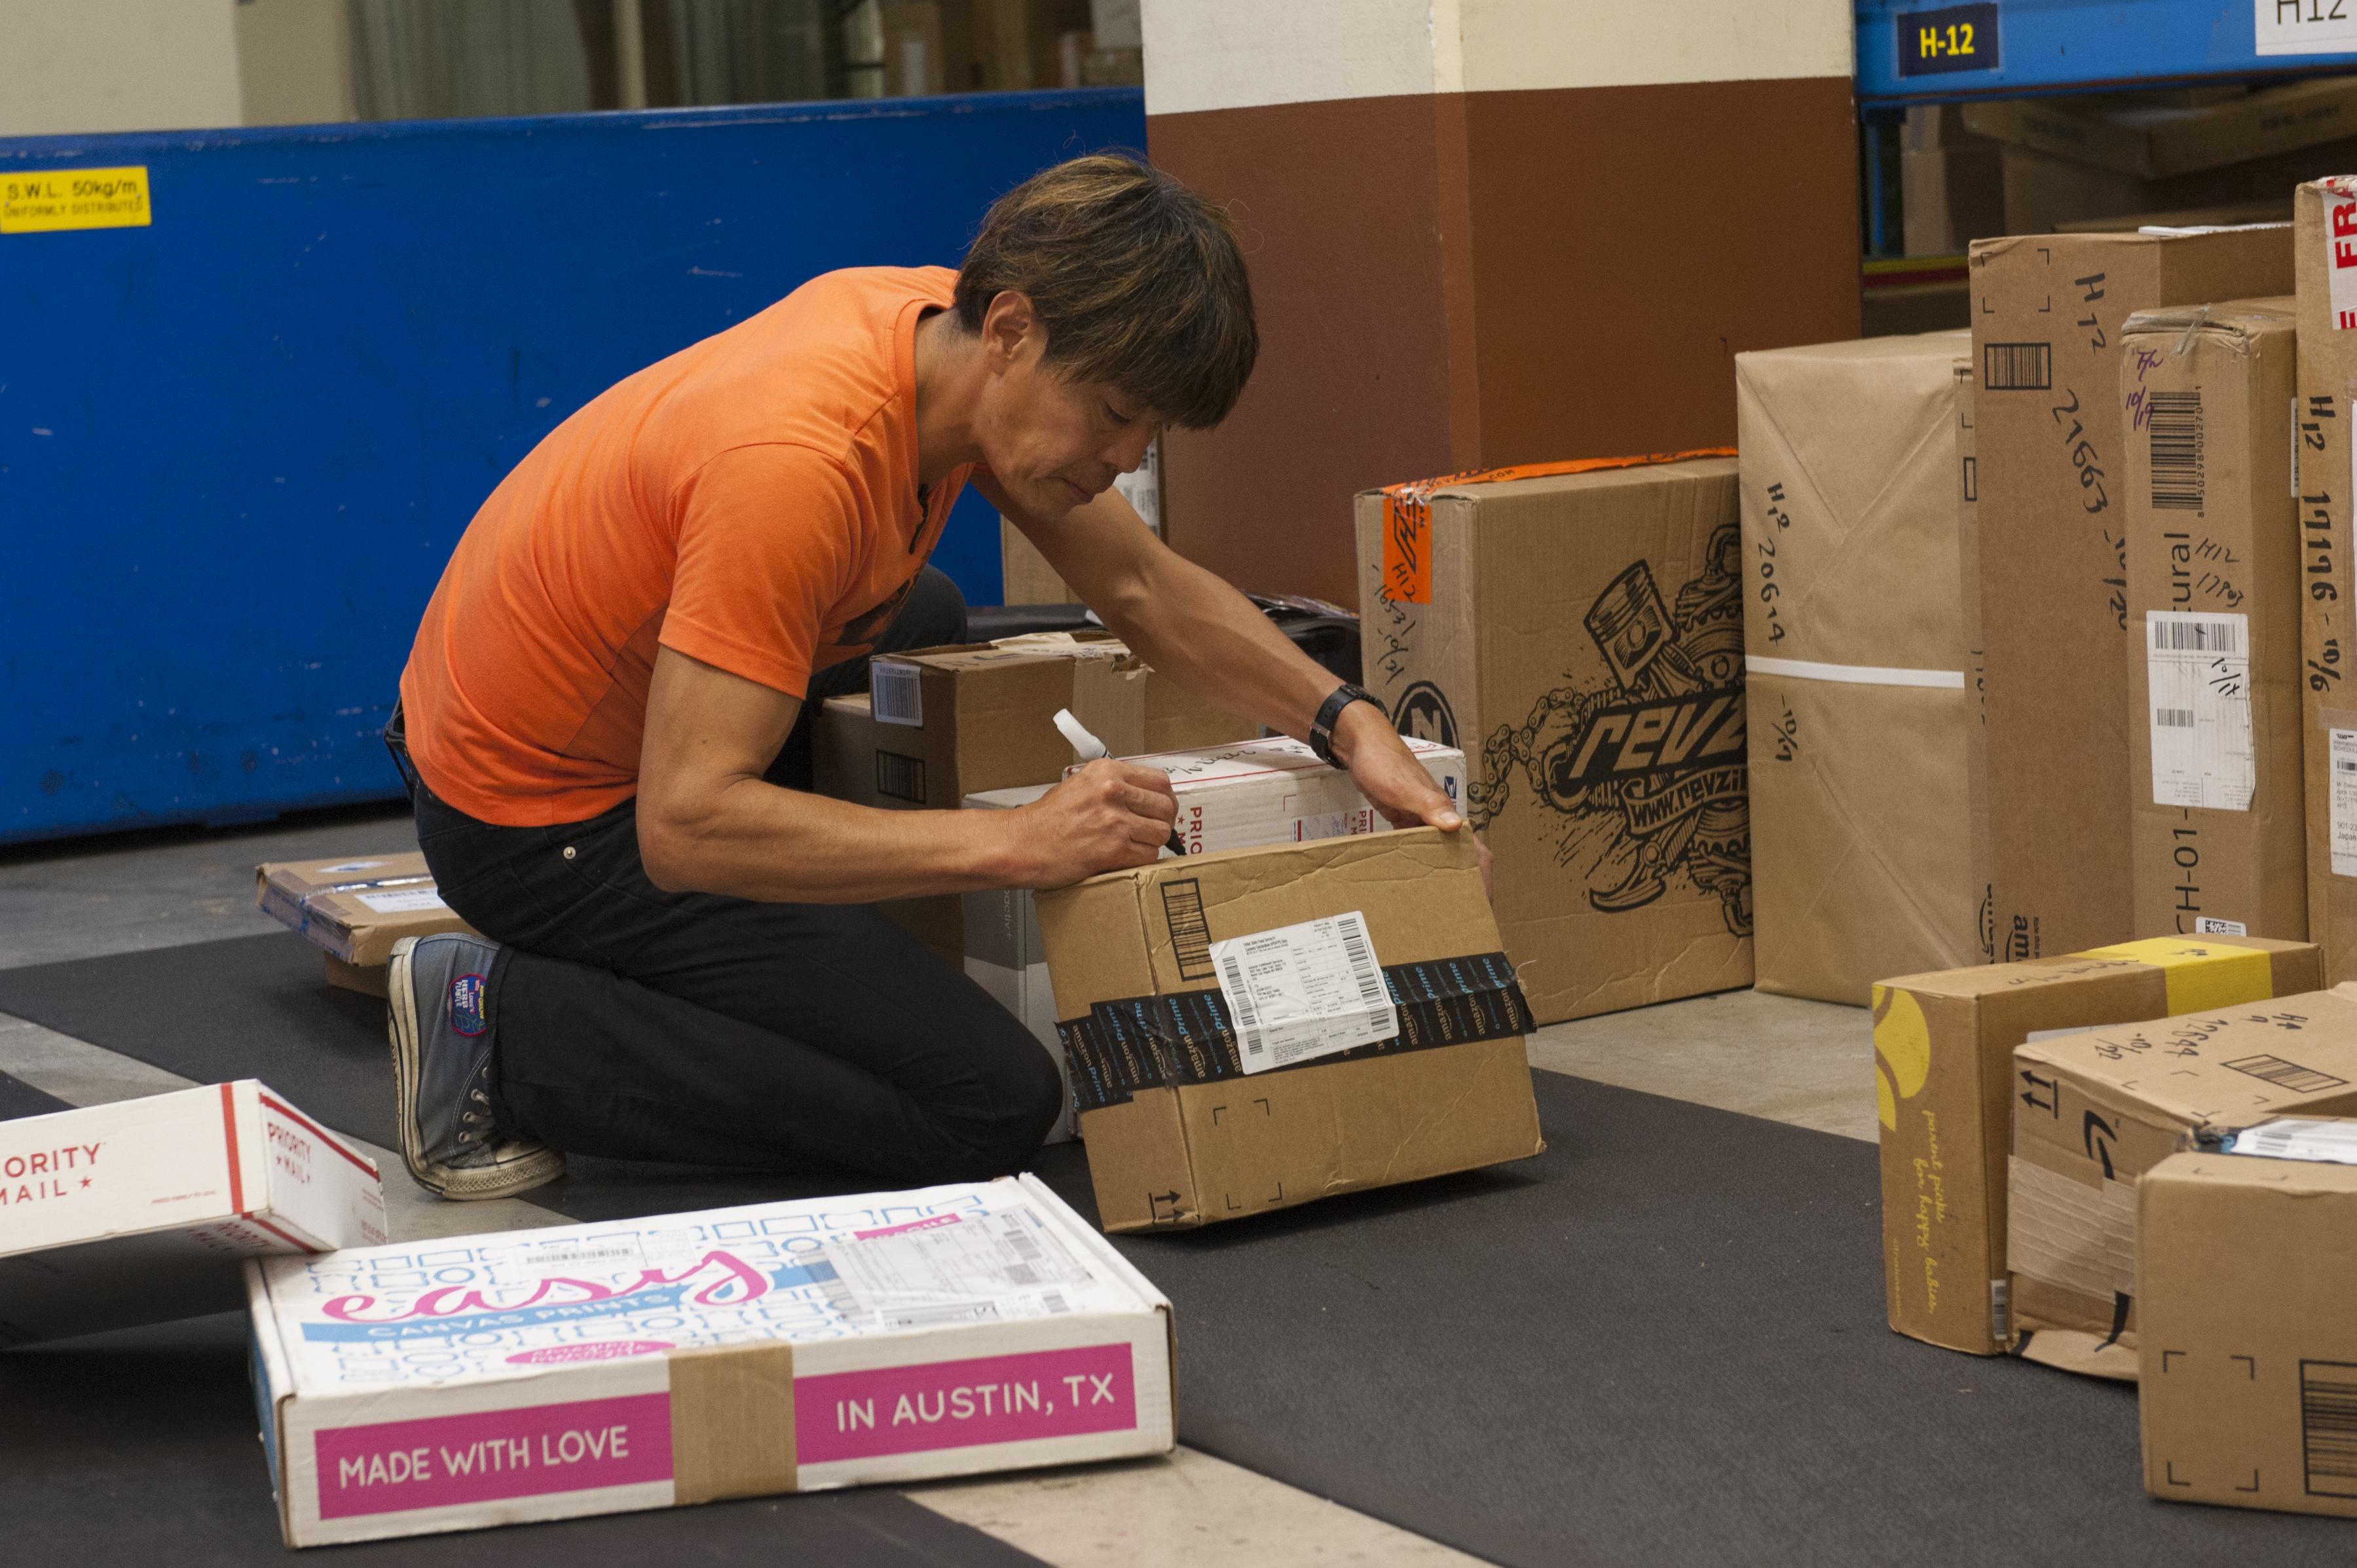 Art - Post office parcel service ...